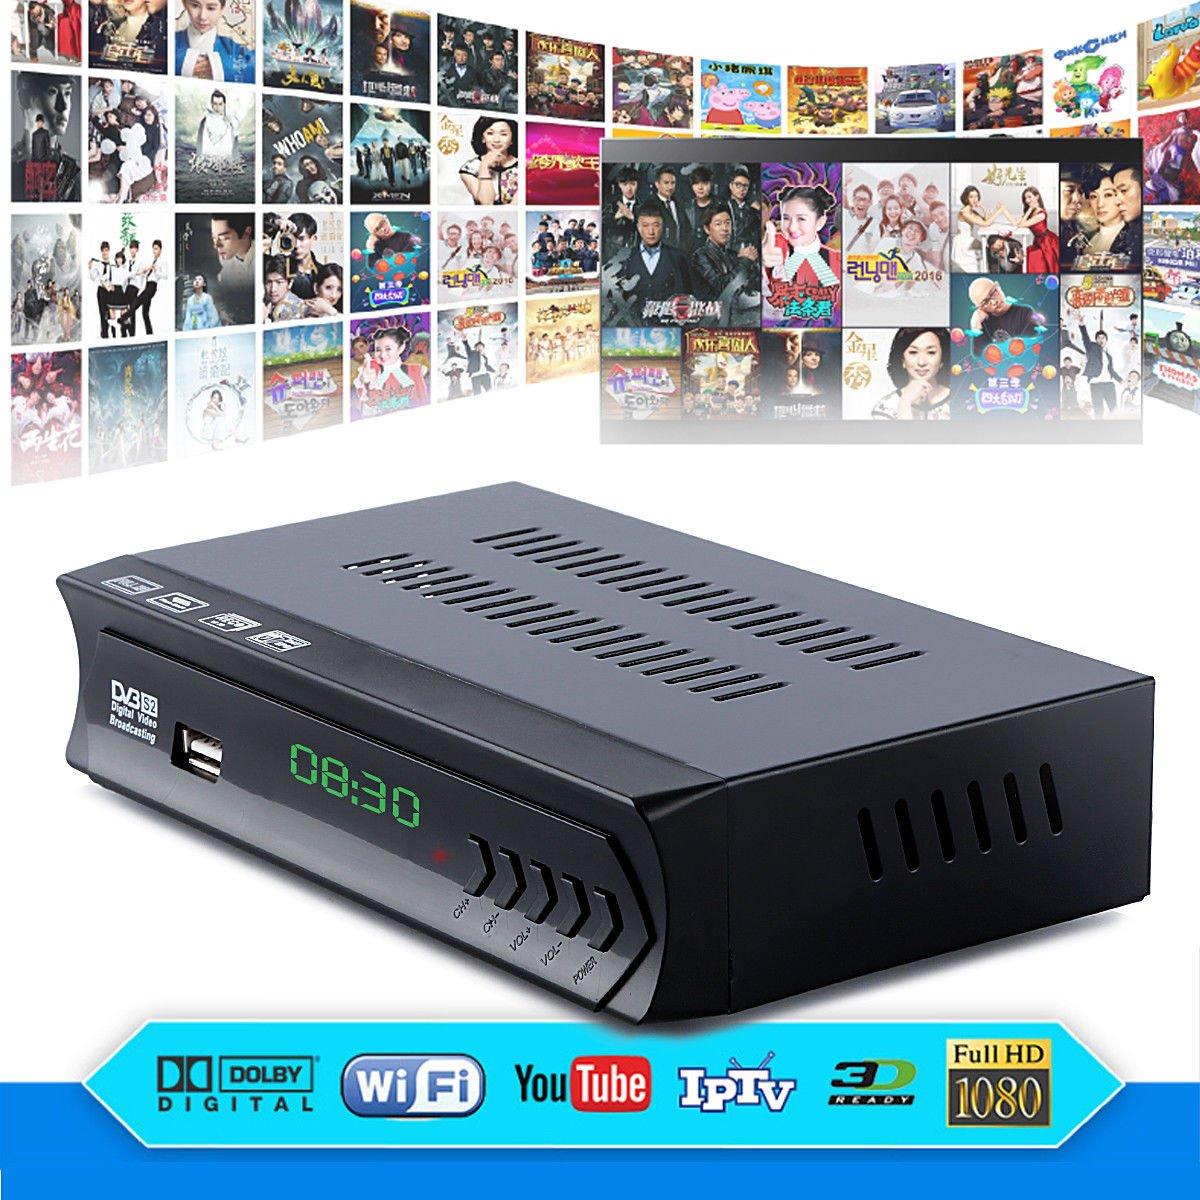 FidgetFidget DVB-S2 Digital Satellite + Wifi IPTV Combo AC3 Receiver Blind TV BOX IKS Youtube by FidgetFidget